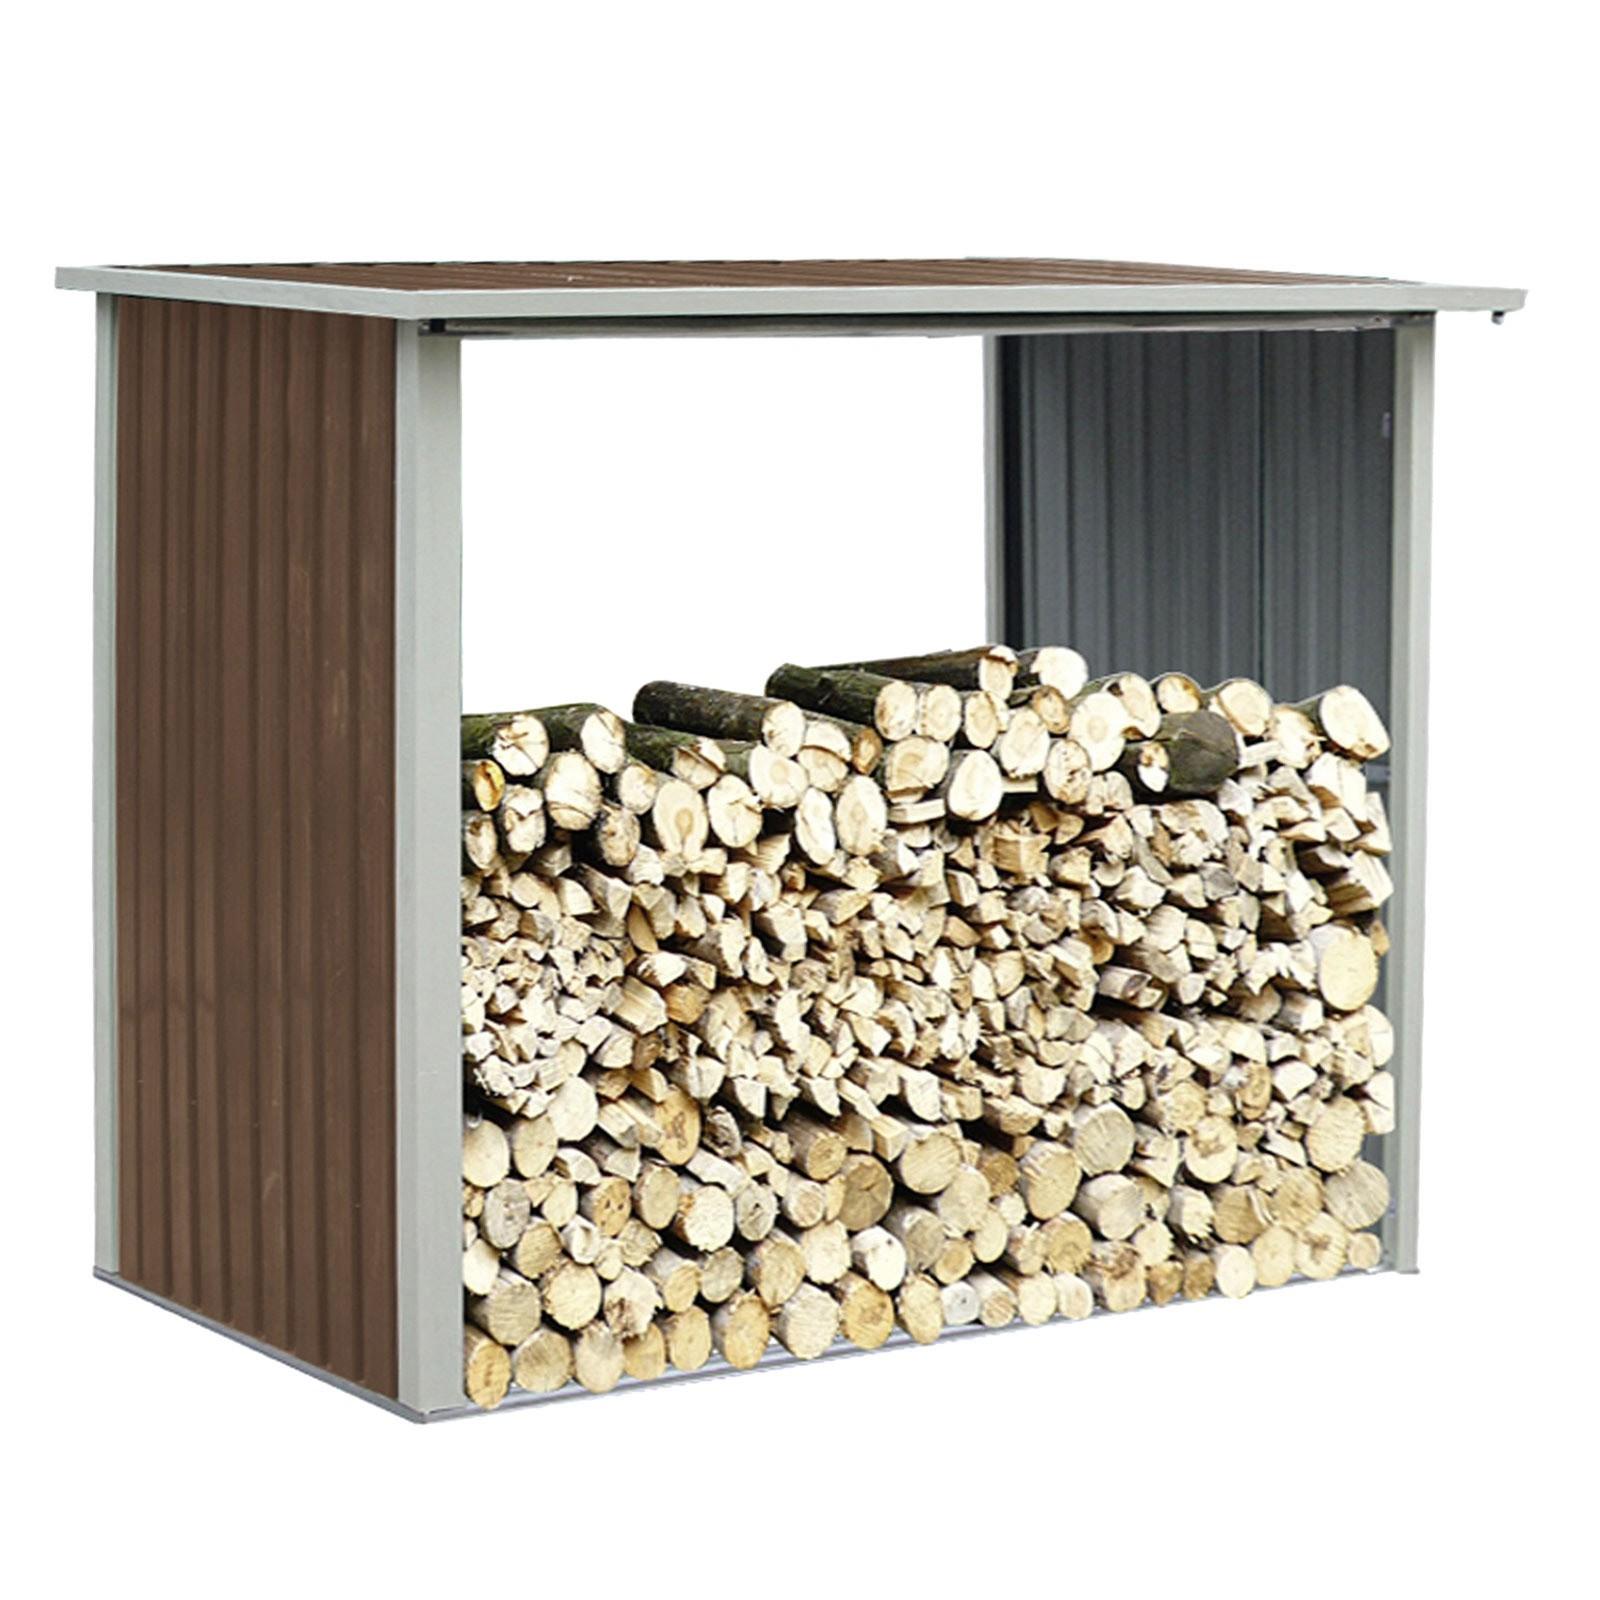 kaminholz brennholz stapelhilfe holzlager berdacht 243x89x190 kopenhagen. Black Bedroom Furniture Sets. Home Design Ideas